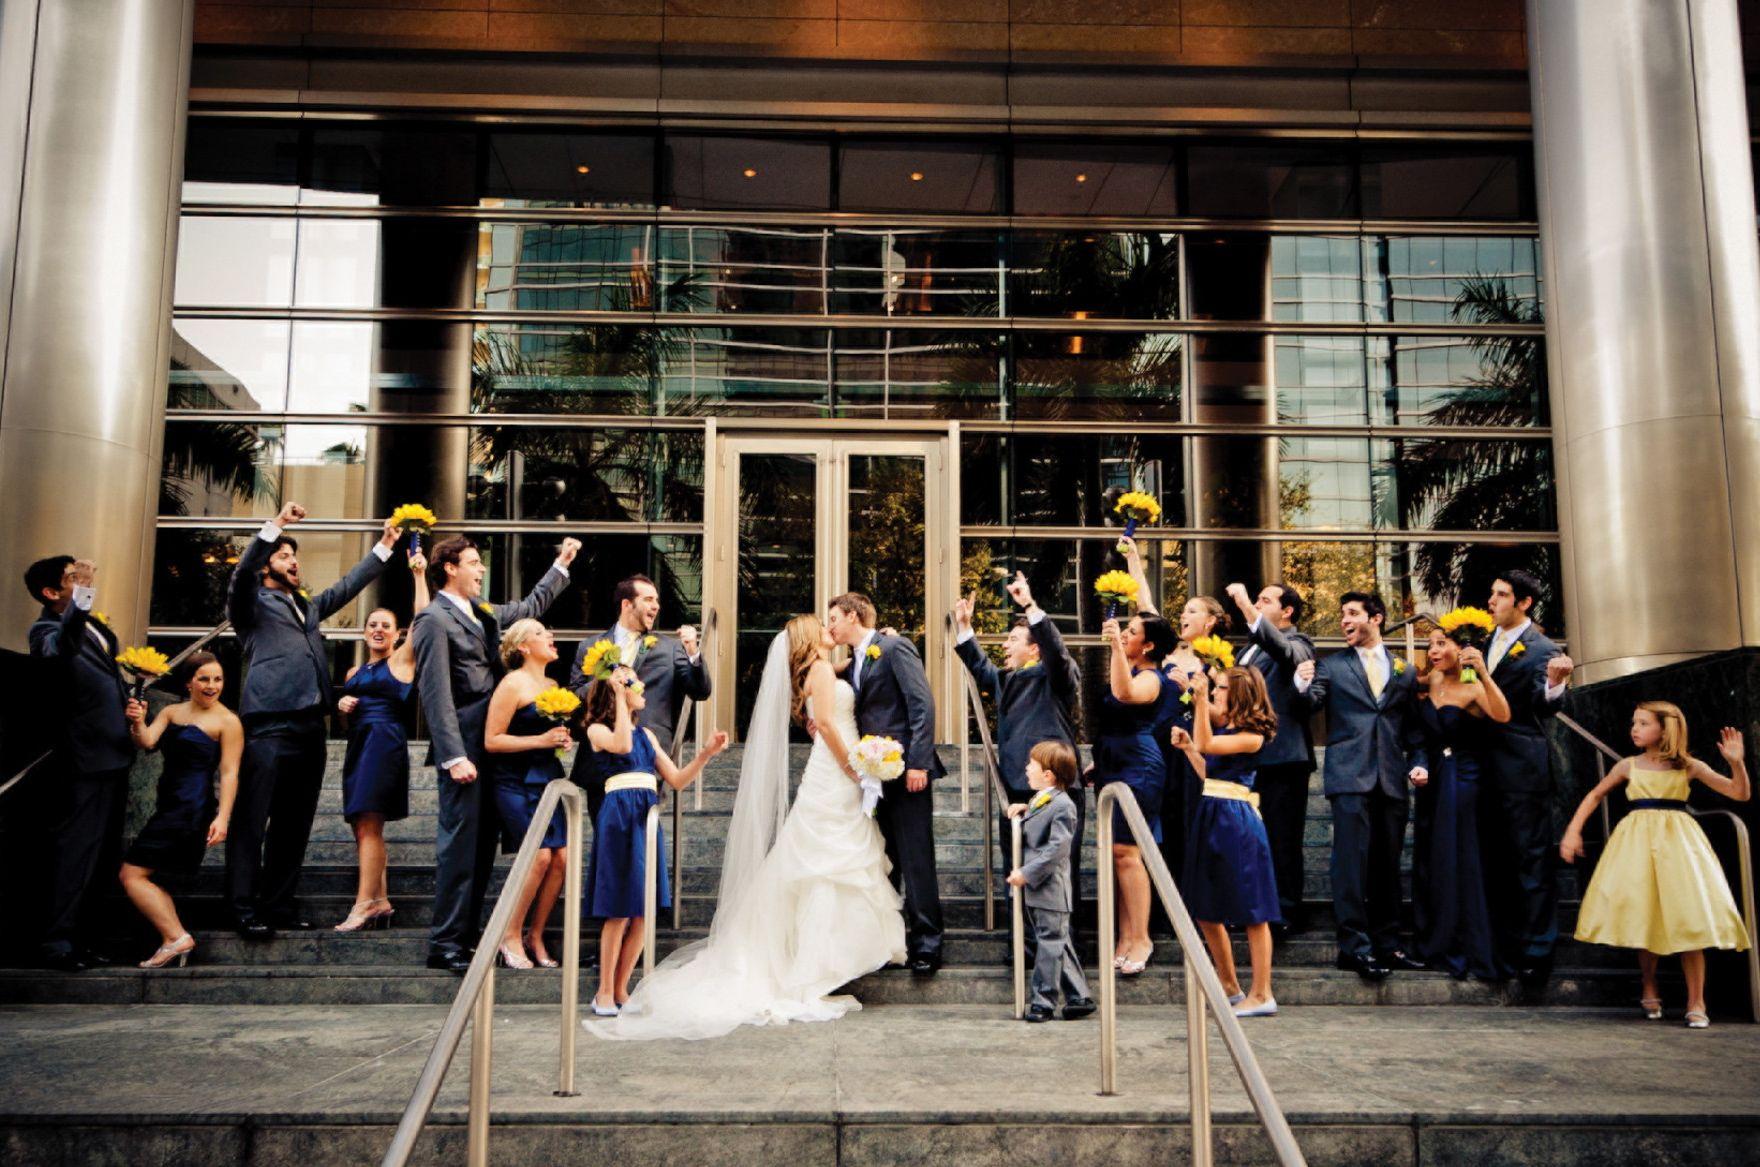 Sunny yellow pops against navy bridesmaid dresses and suits at sunny yellow pops against navy bridesmaid dresses and suits at four seasons hotel miami ombrellifo Images